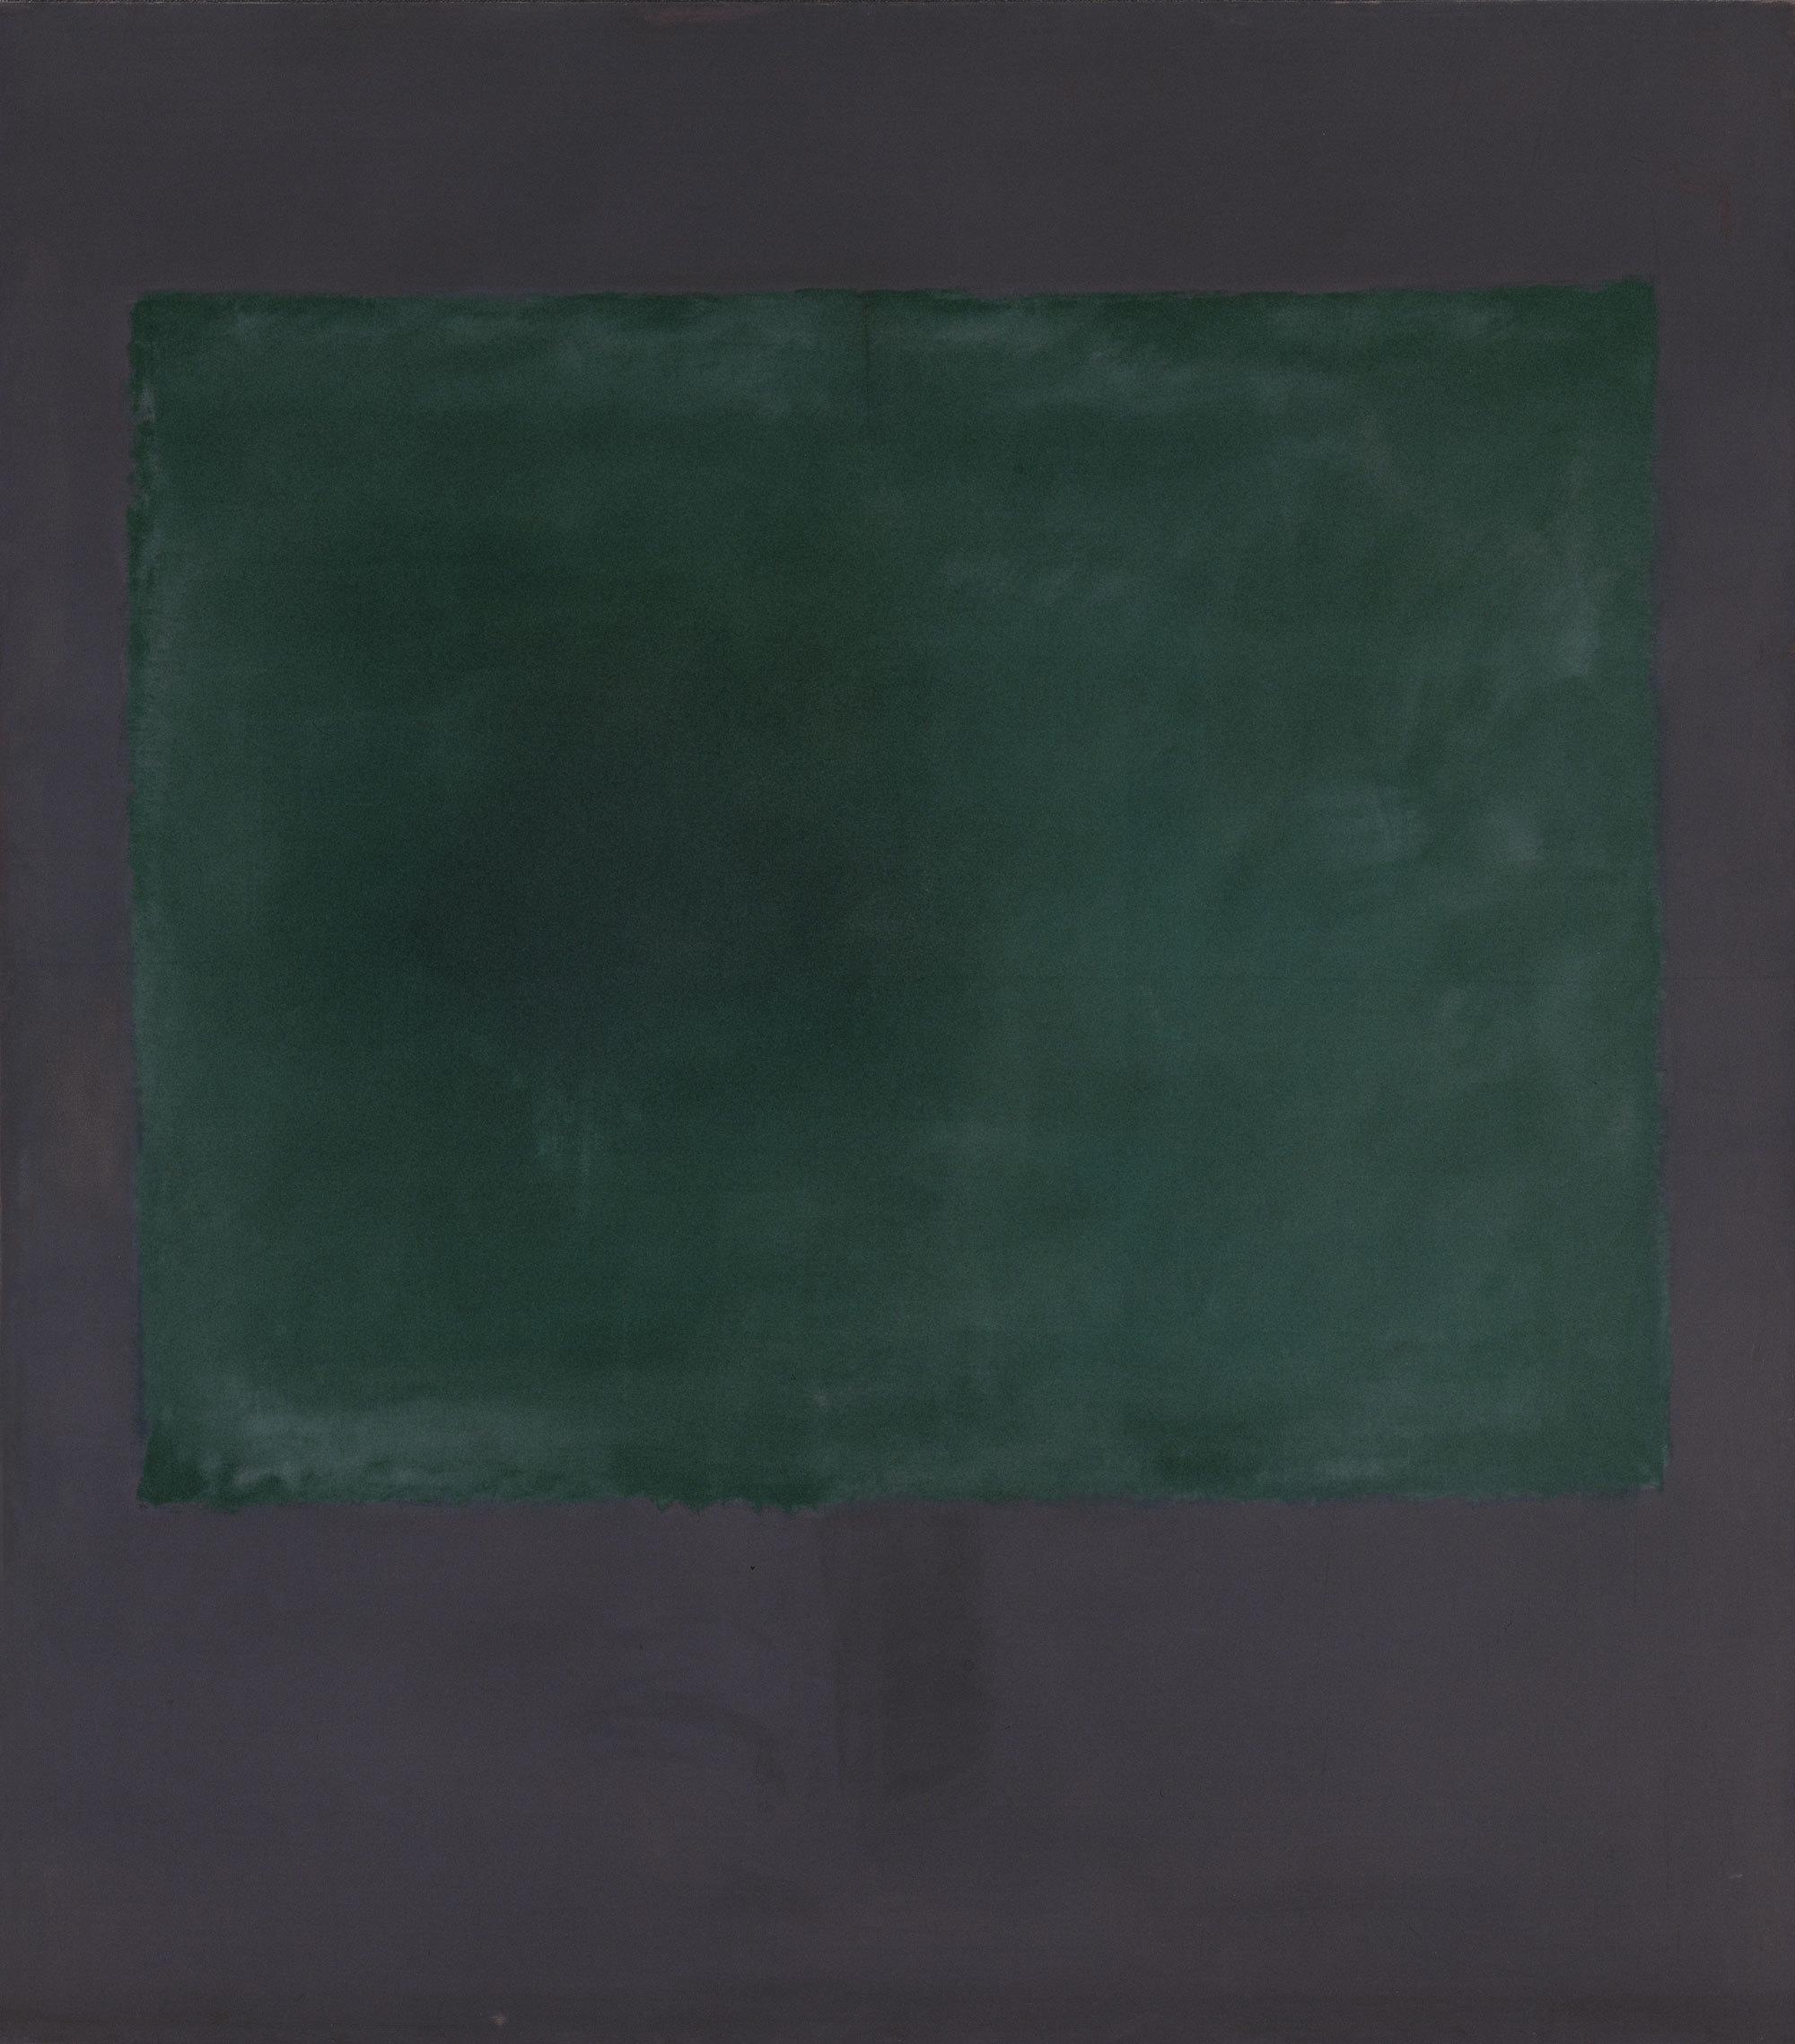 Mark Rothko, Untitled (Green on Maroon)